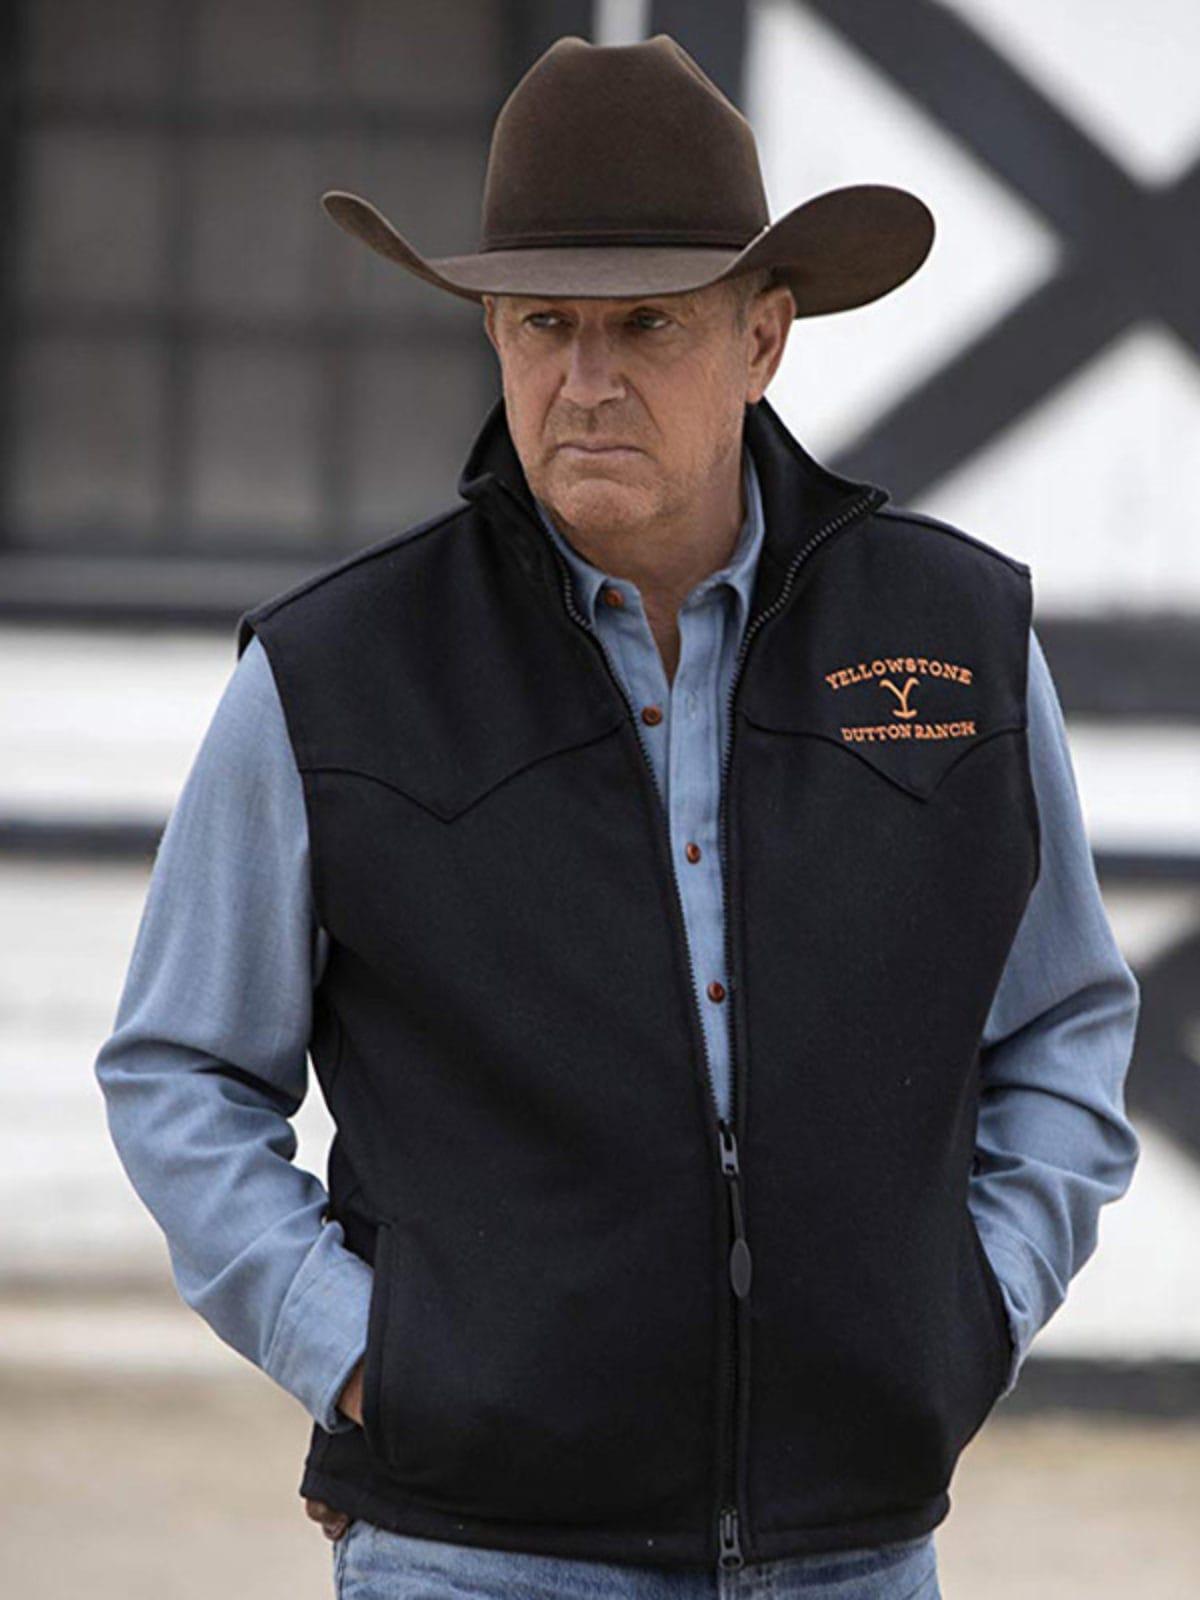 Yellowstone John Dutton Vest